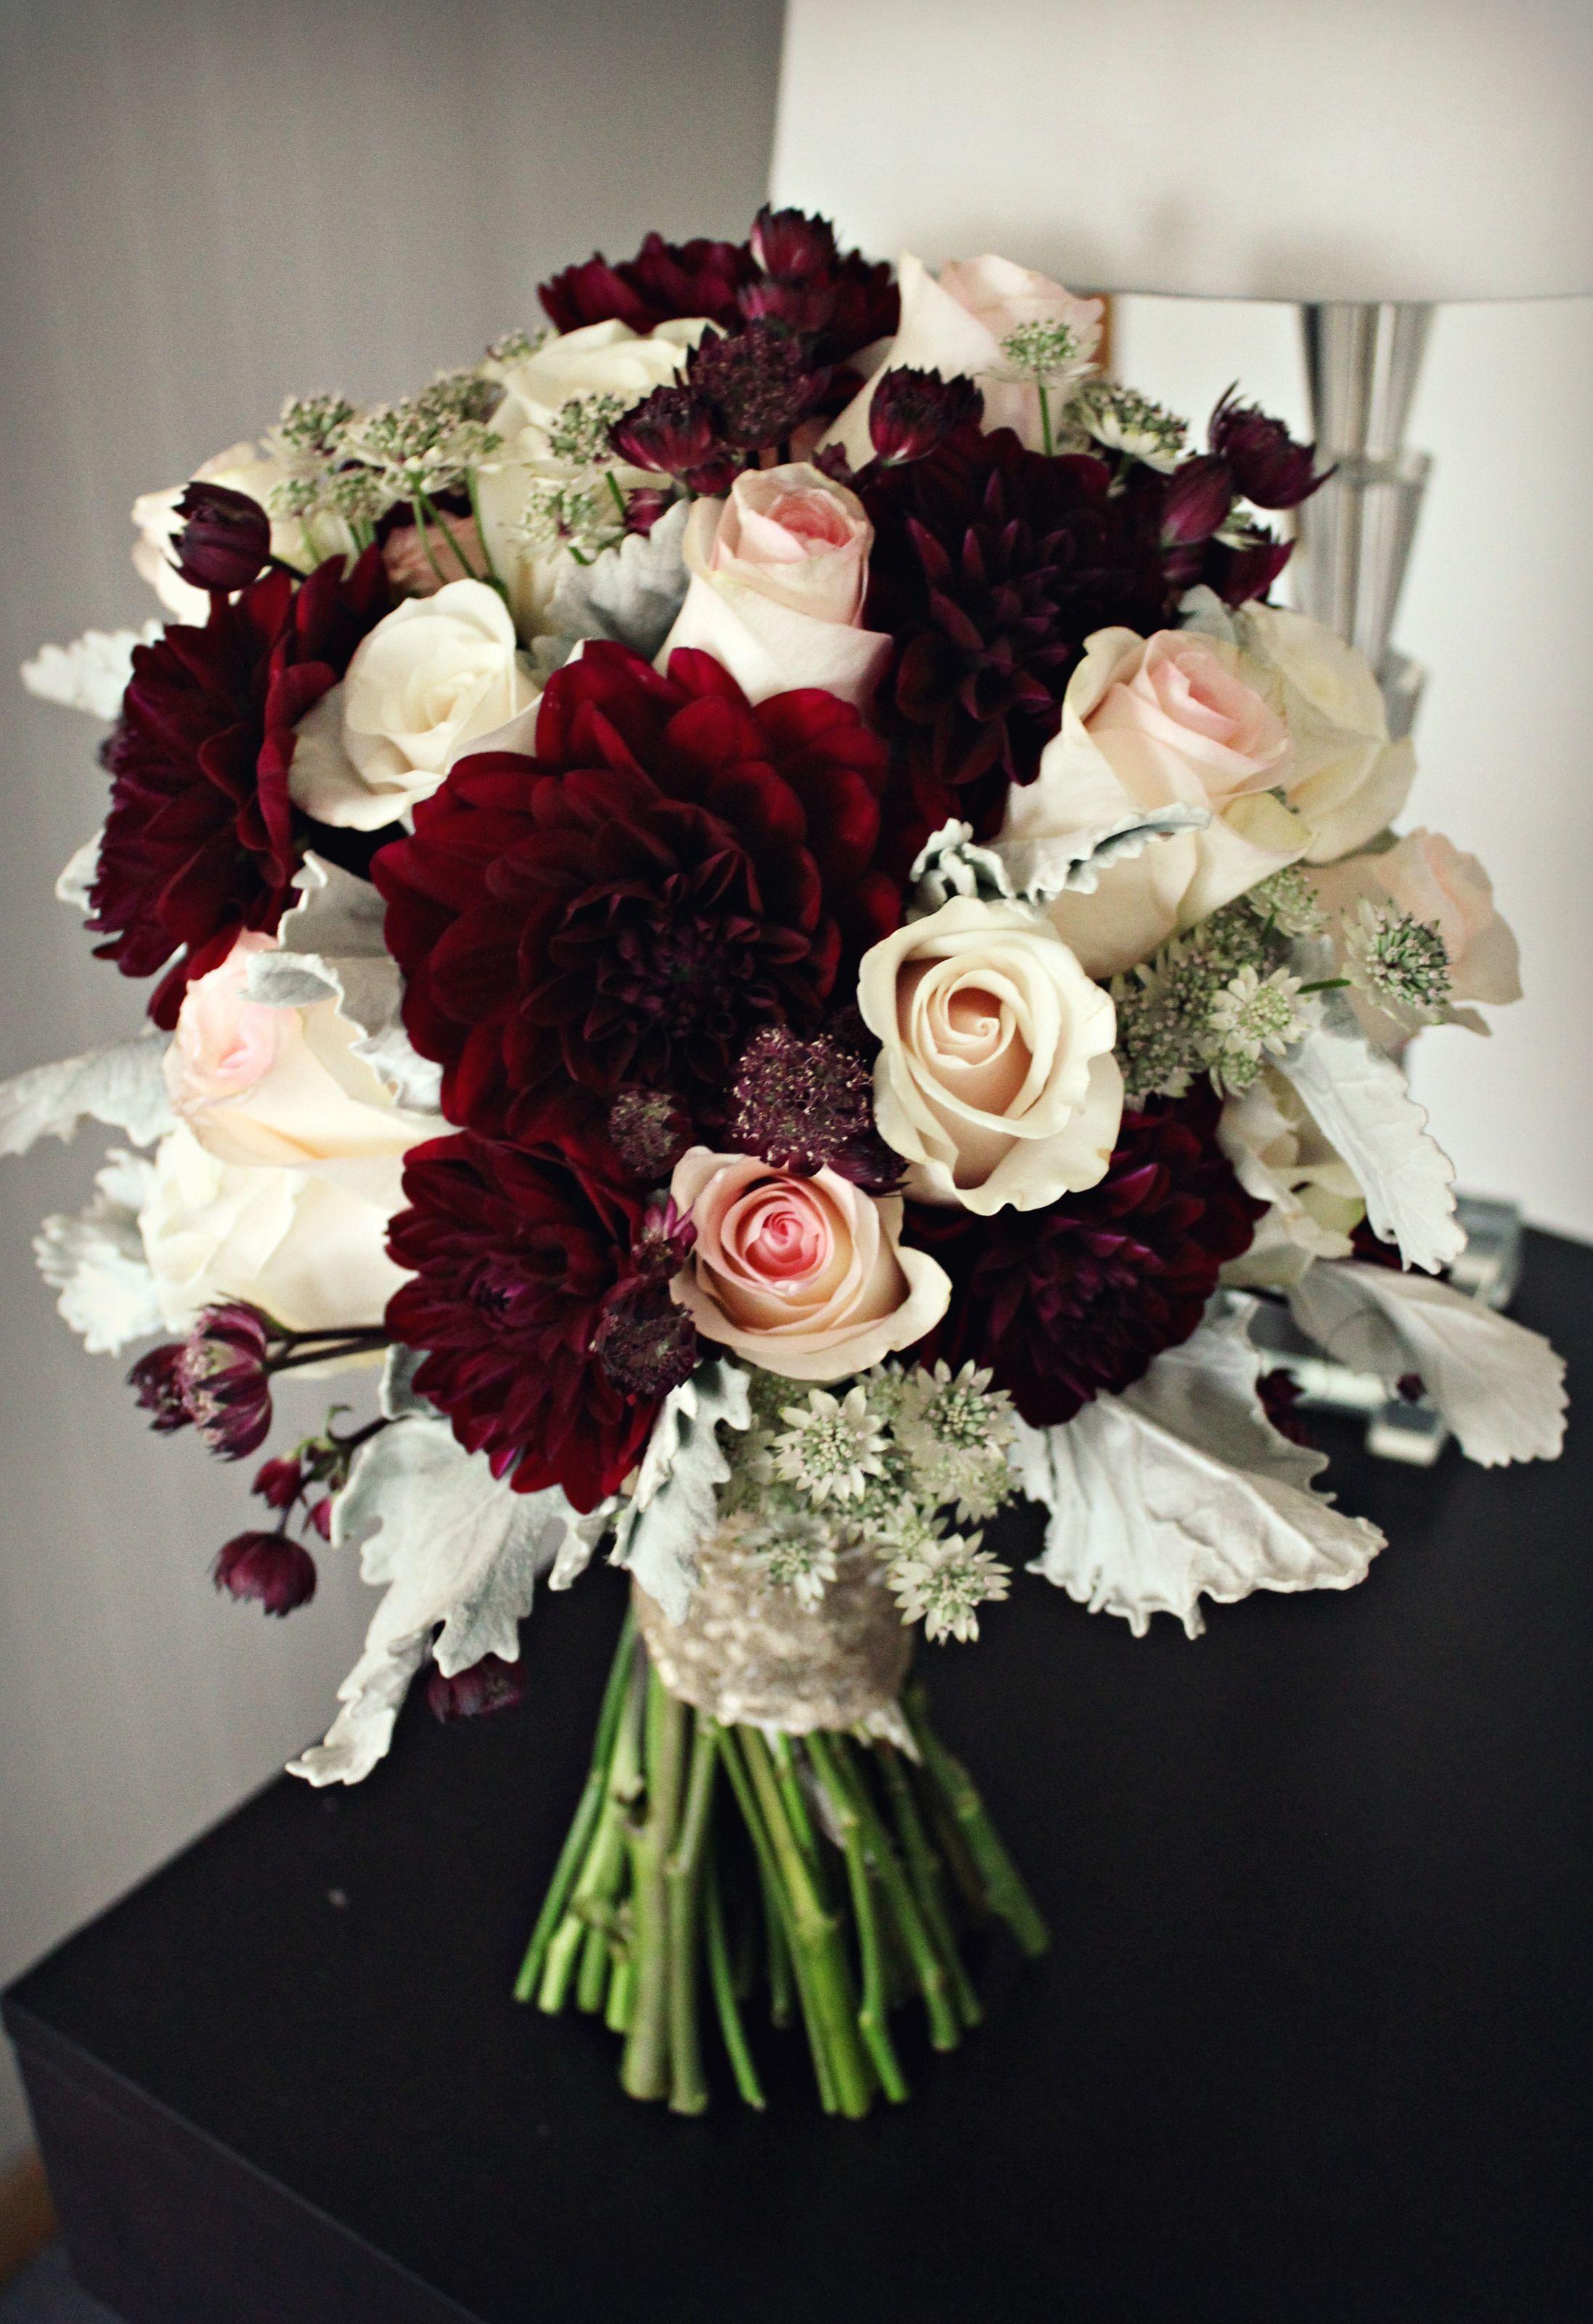 Blush burgundy and champagne wedding burgundy dahlias blush roses blush burgundy and champagne wedding burgundy dahlias blush roses and ivory roses champagne sequin wrap izmirmasajfo